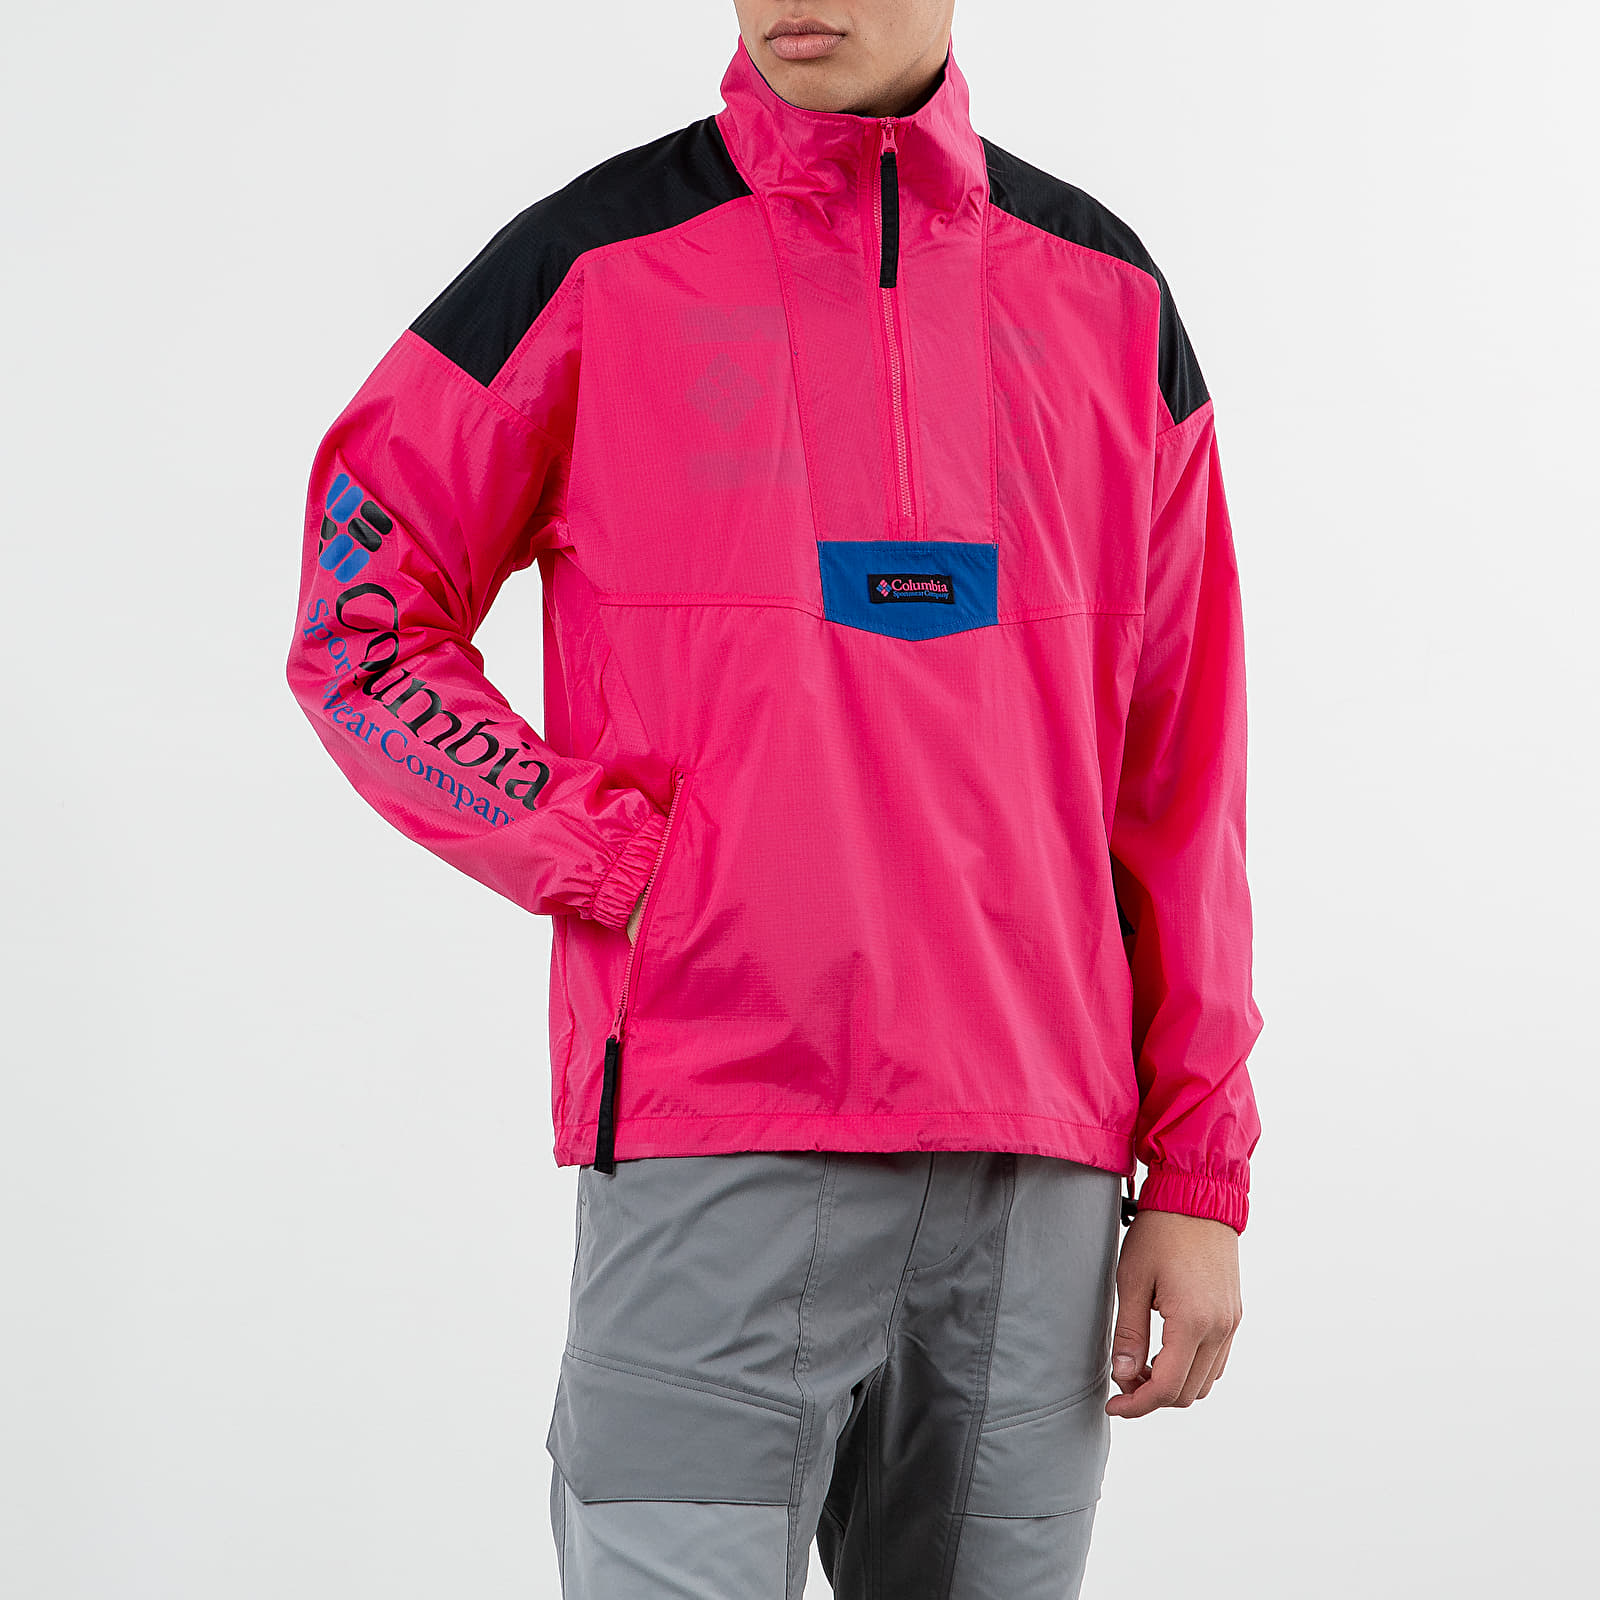 Bundy Columbia Santa Ana Anorak Jacket Cactus Pink/ Black